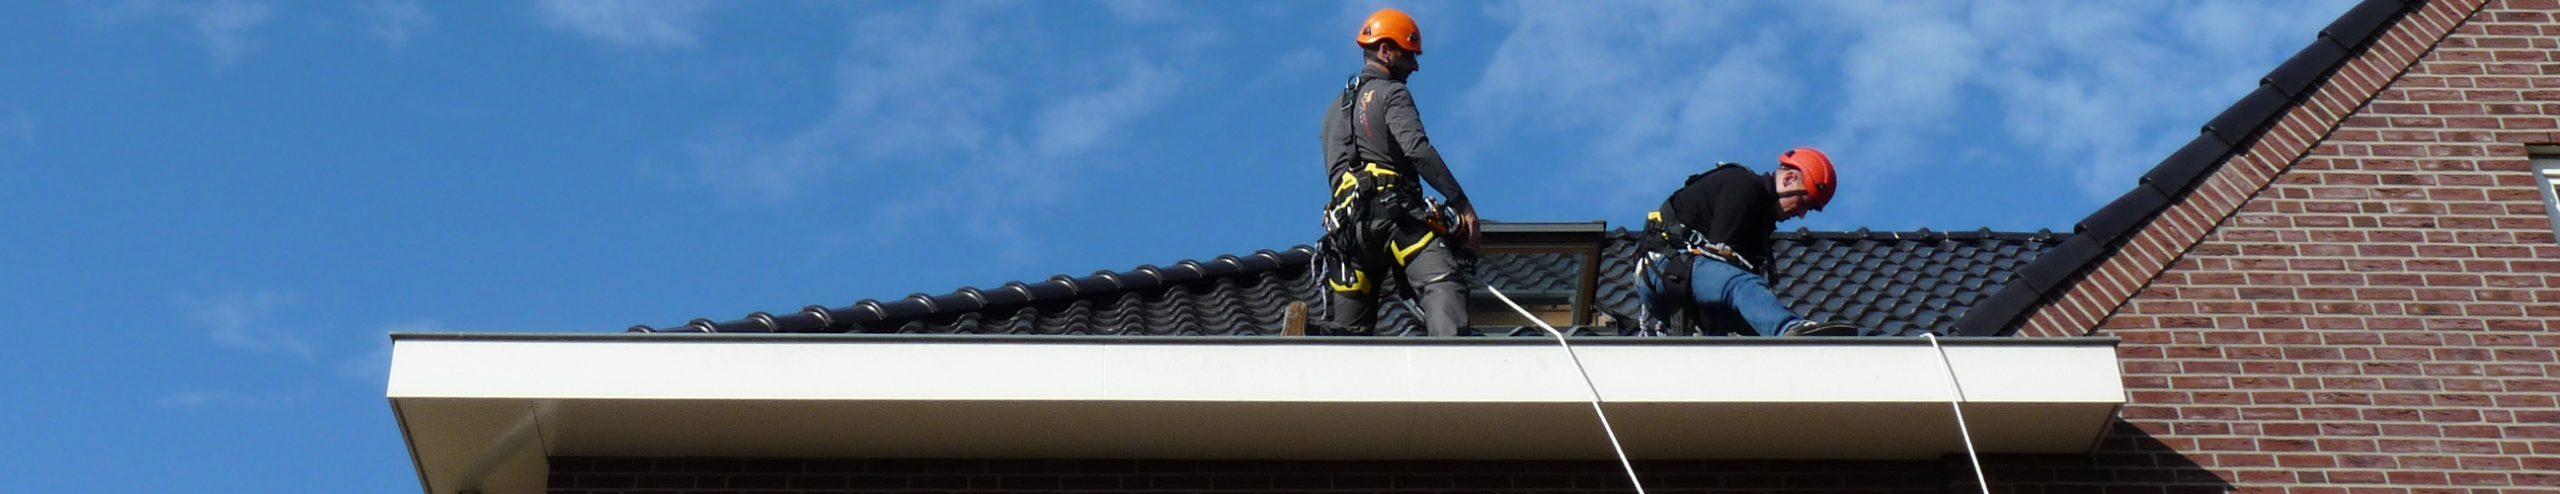 rope access inspectie dak